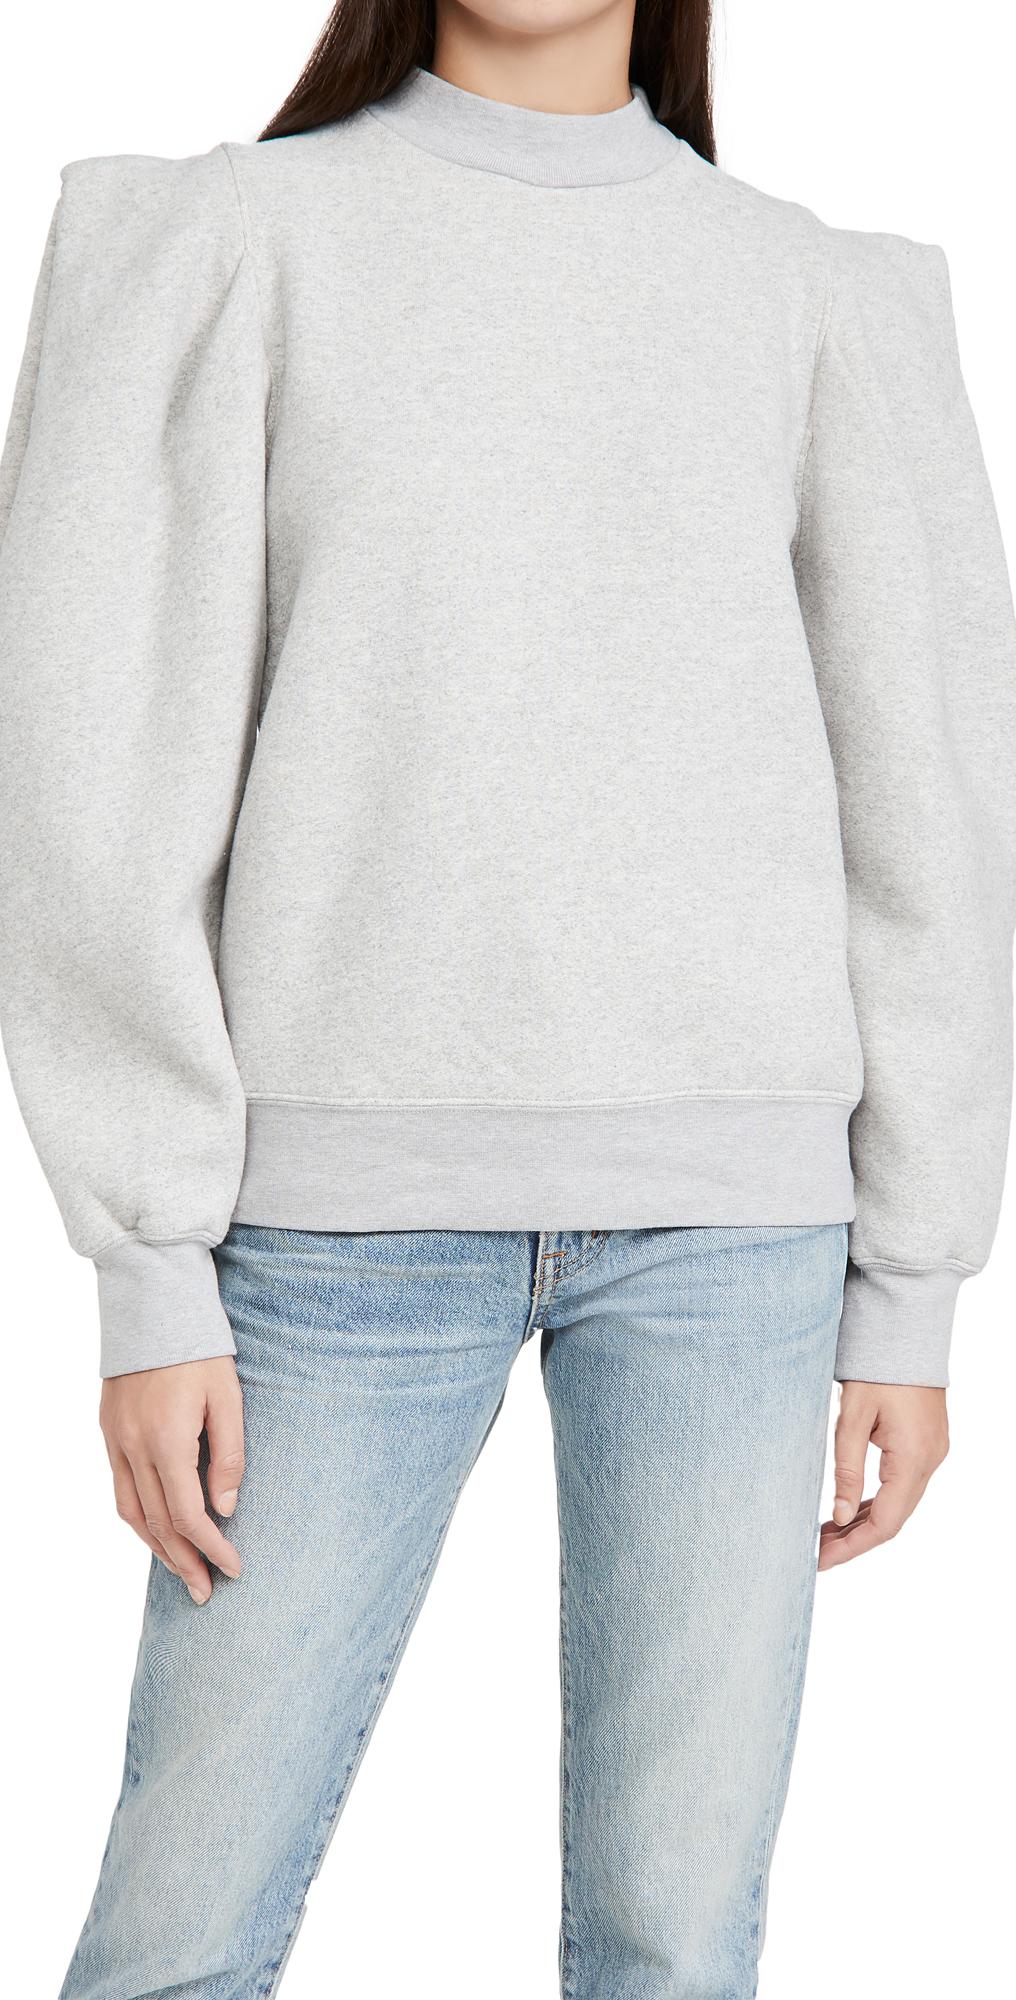 AGOLDE Folded Sleeve Sweatshirt